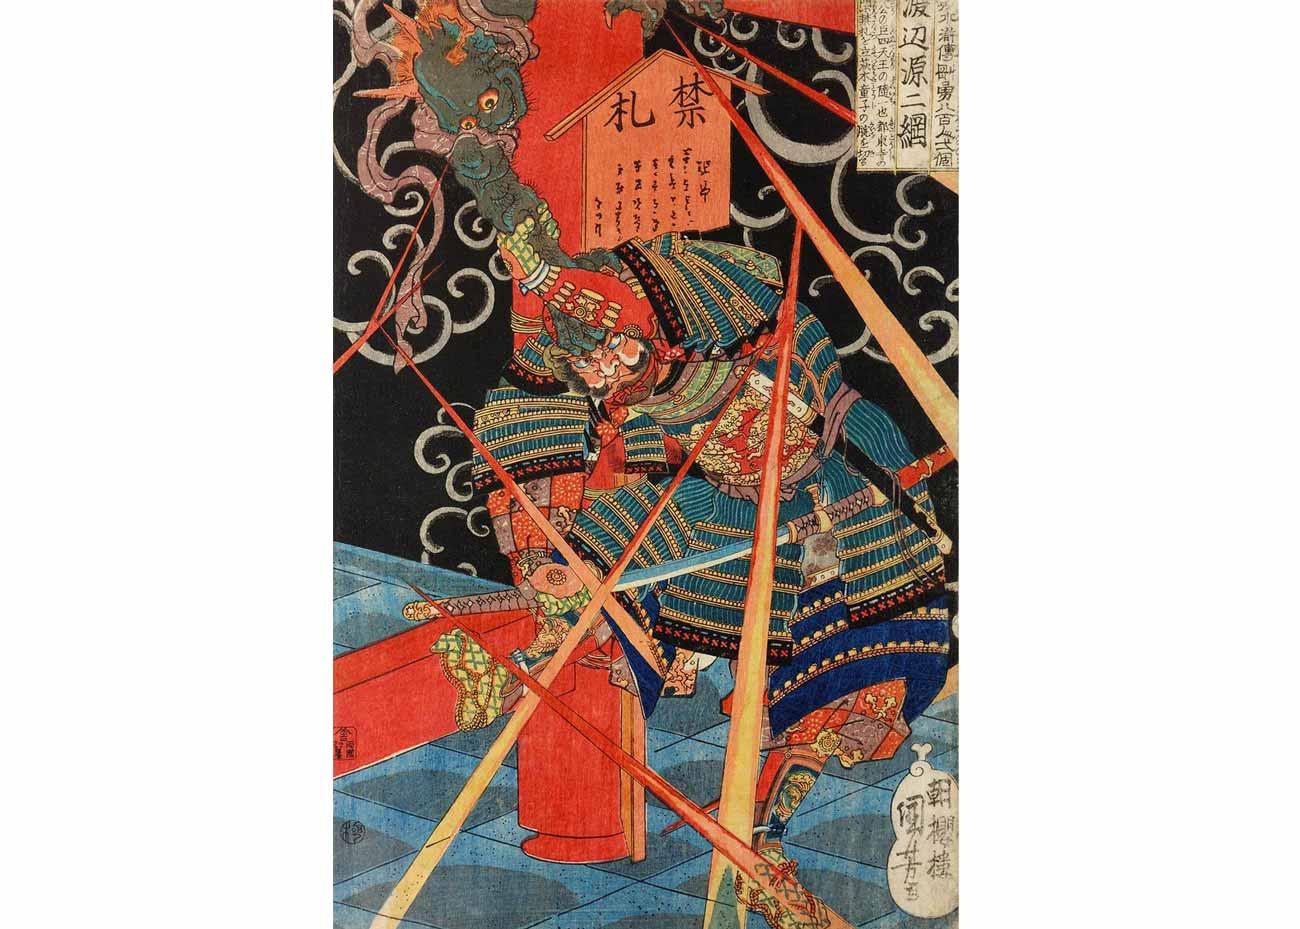 Takiguchi Watanabe, Woodblock Print by Utagawa Kuniyoshi